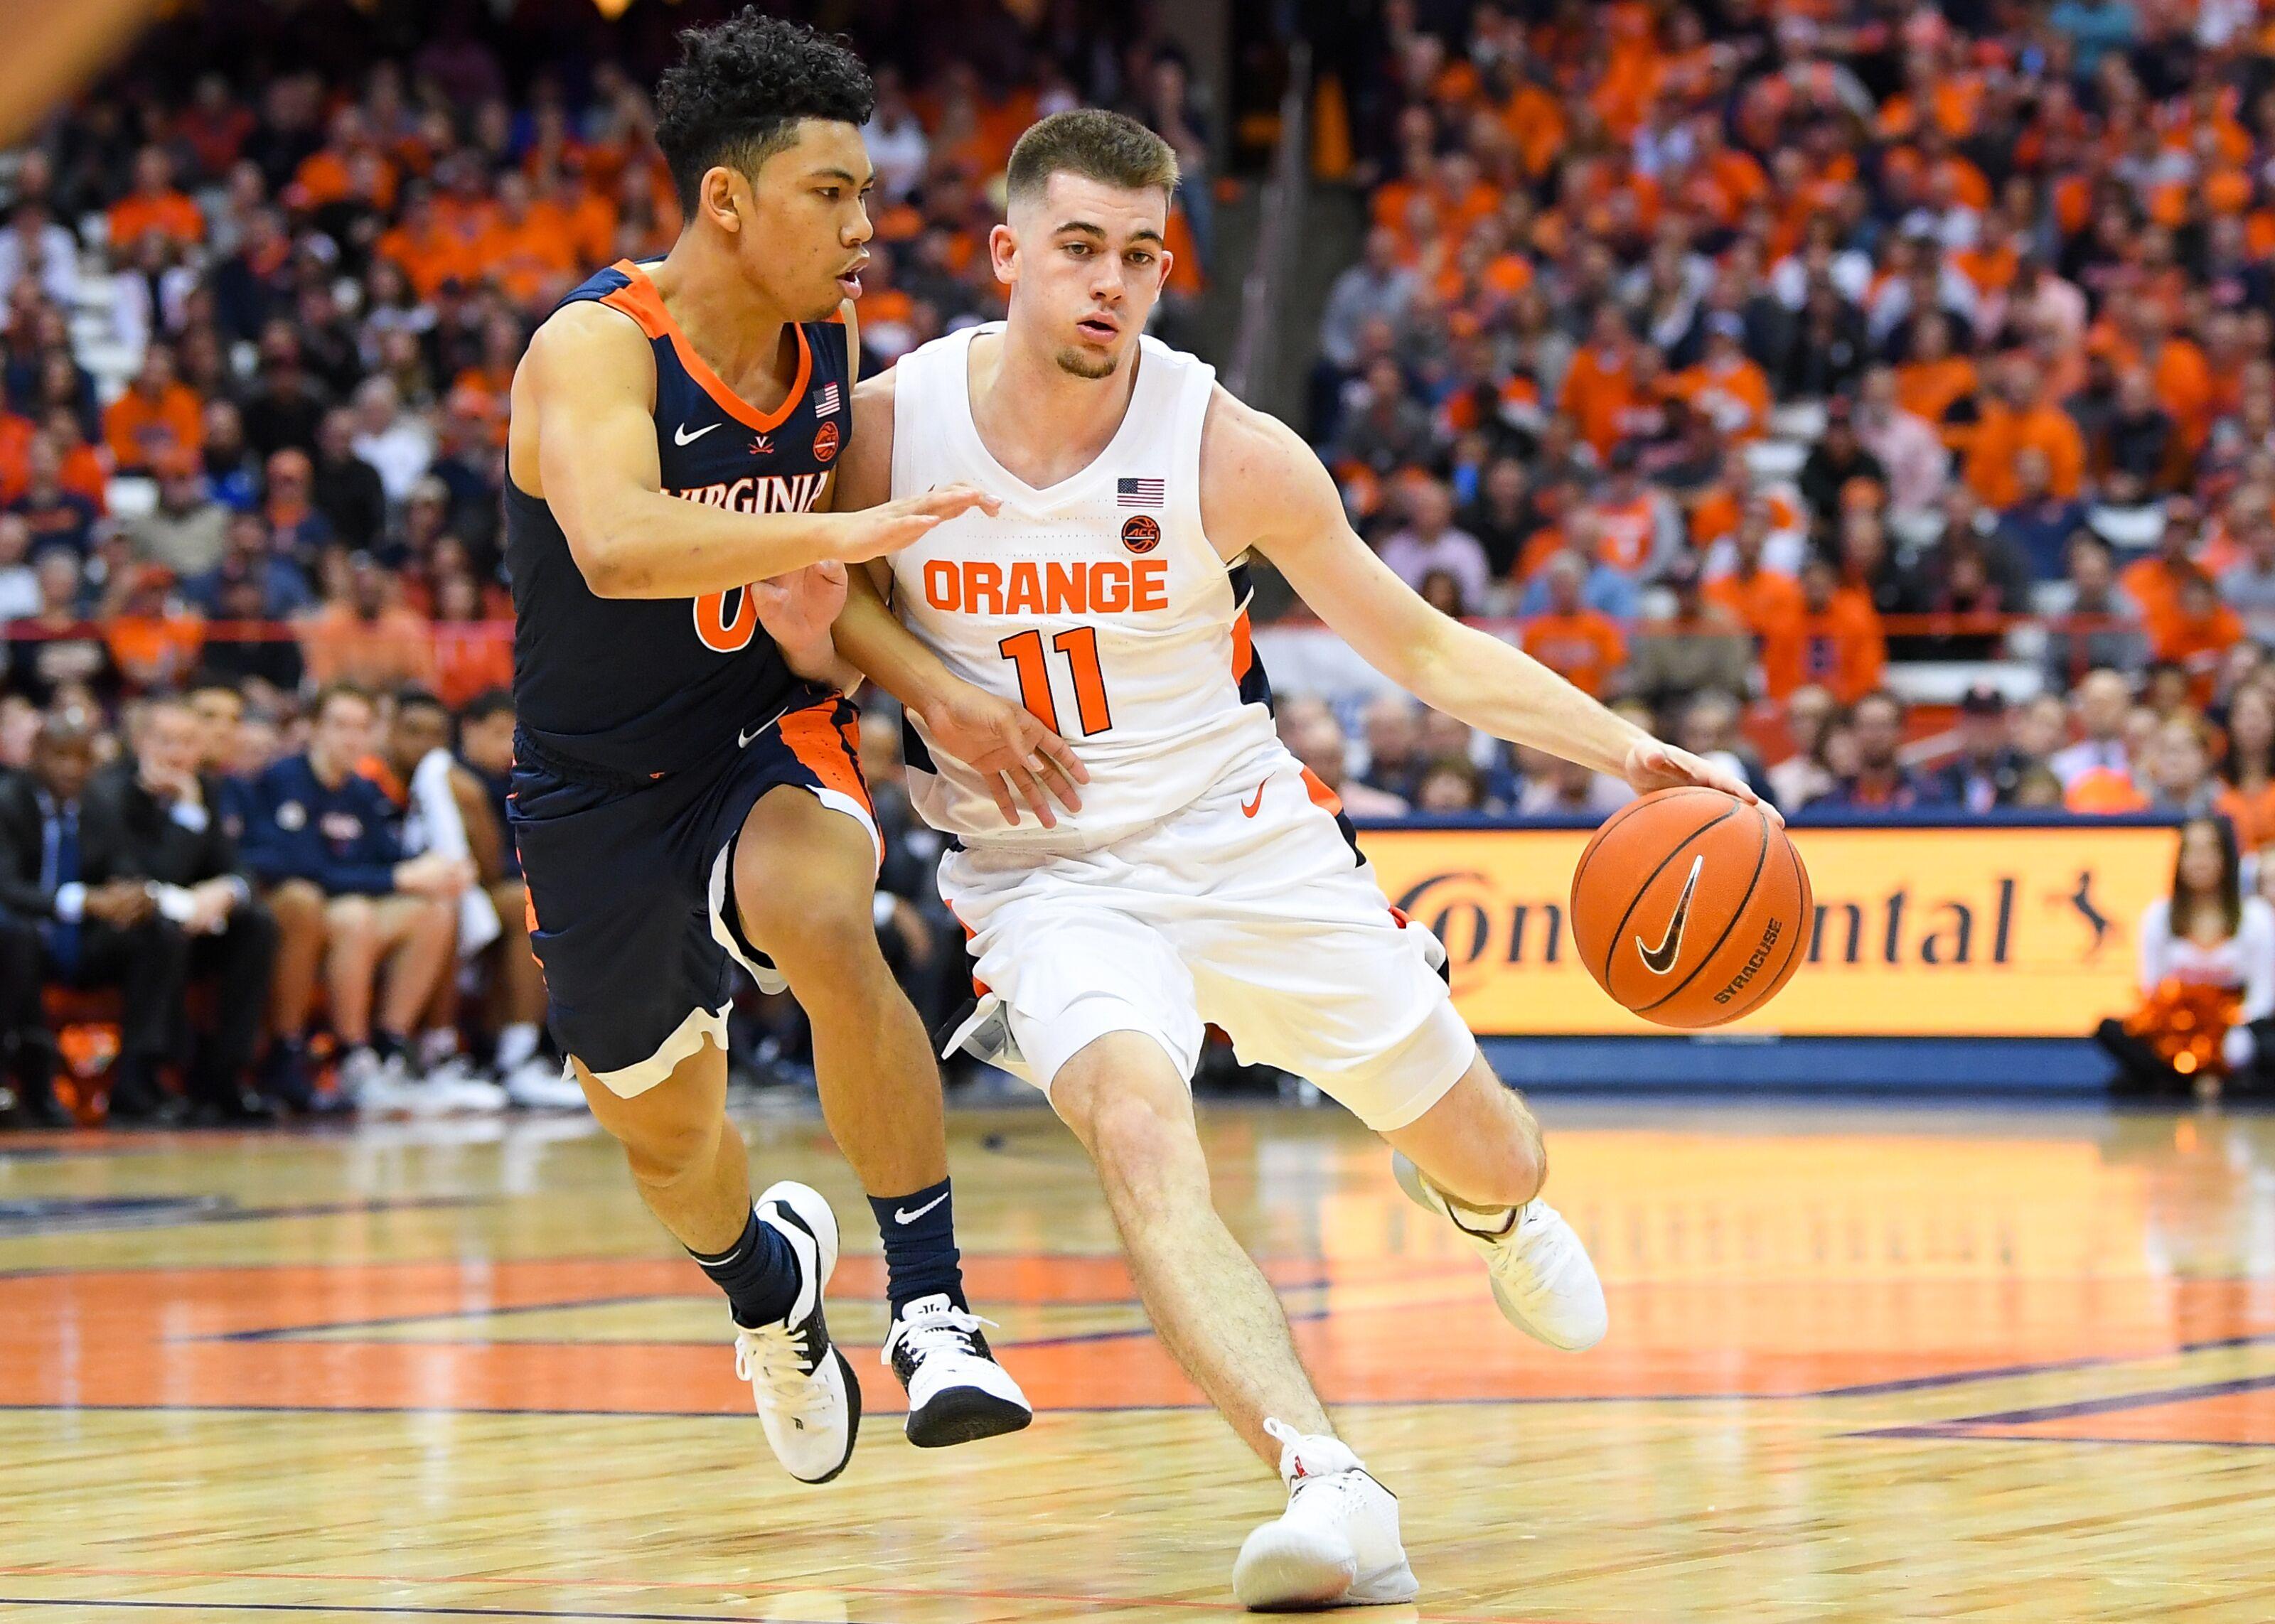 Syracuse Basketball Joe Girard Iii Should Take Over For